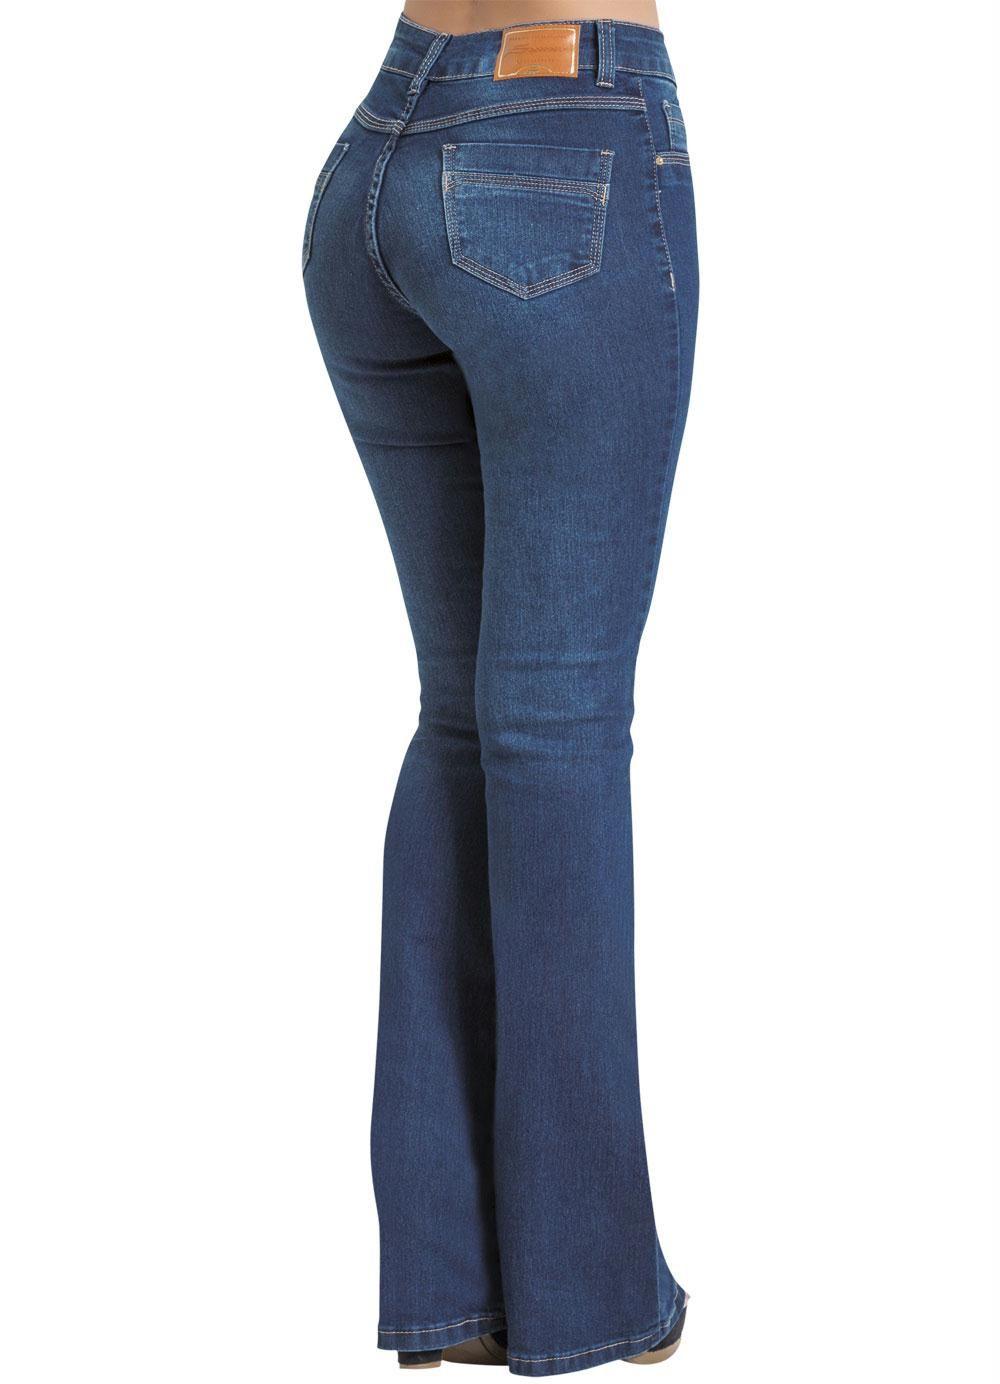 1aeeb3e6a Calça Jeans Sawary Azul Modelo Flare - Posthaus